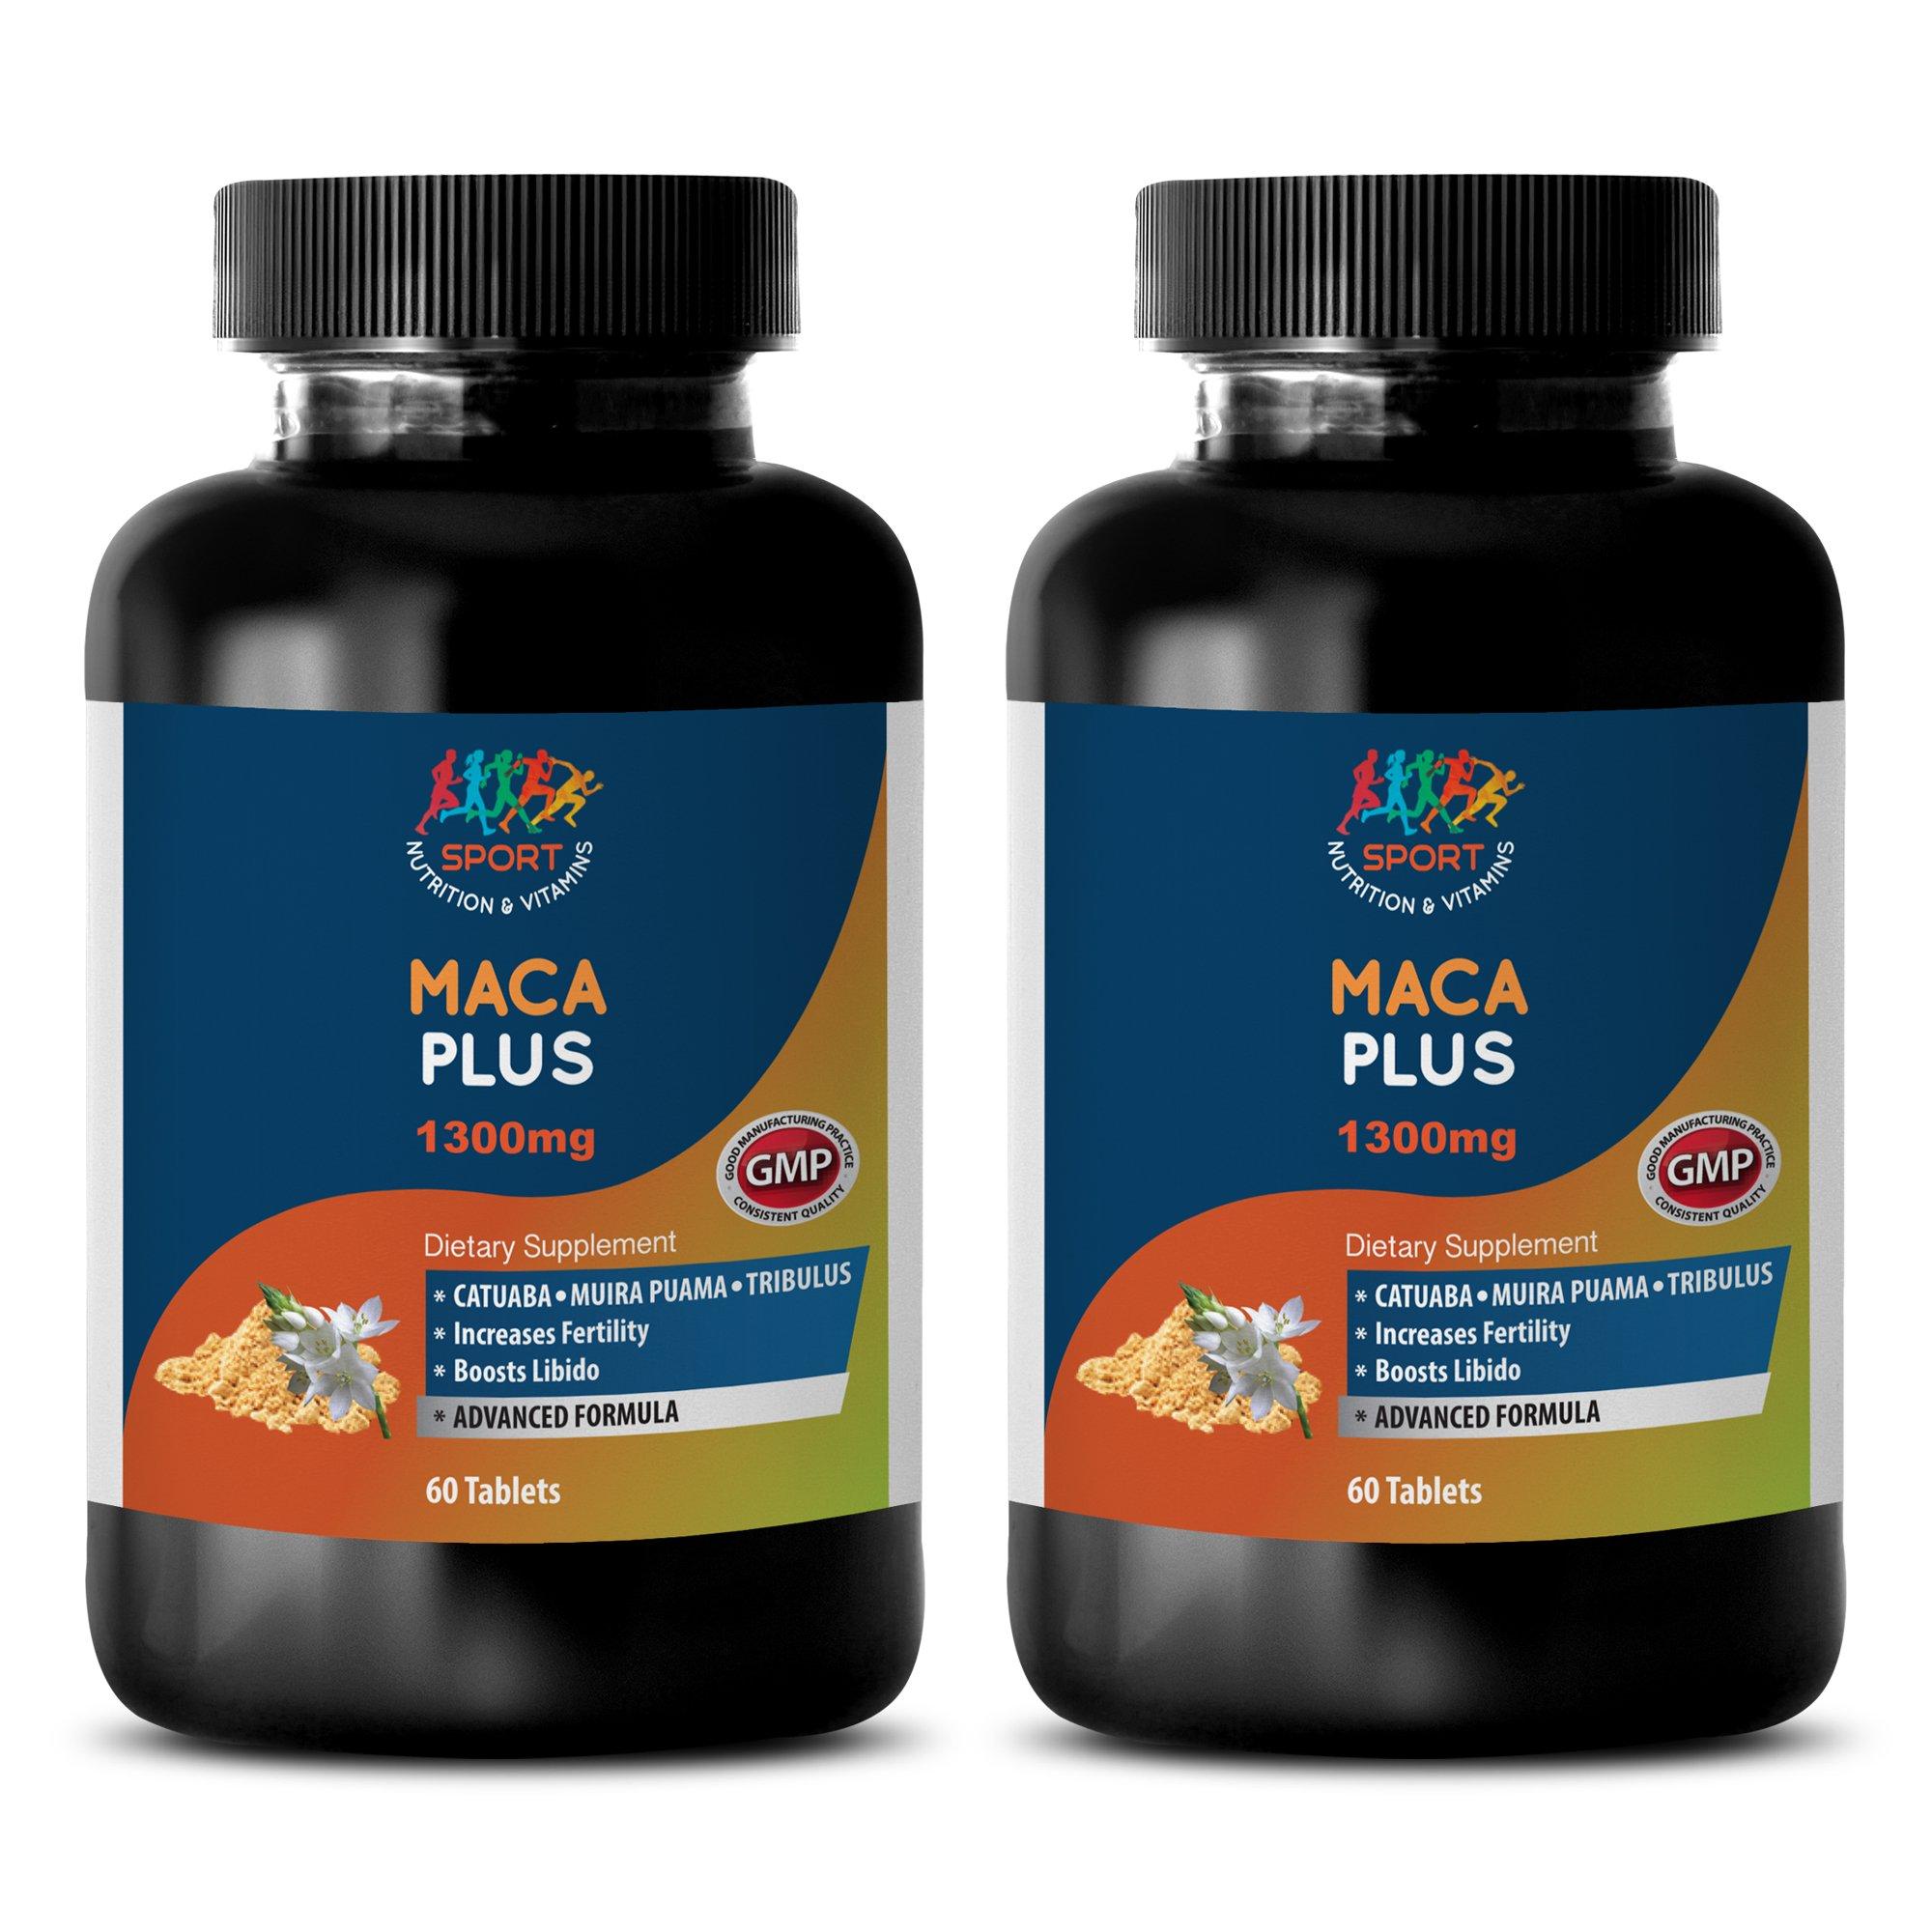 Increase sexual desire for women - MACA PLUS - Maca root women - 2 Bottles 120 Tablets